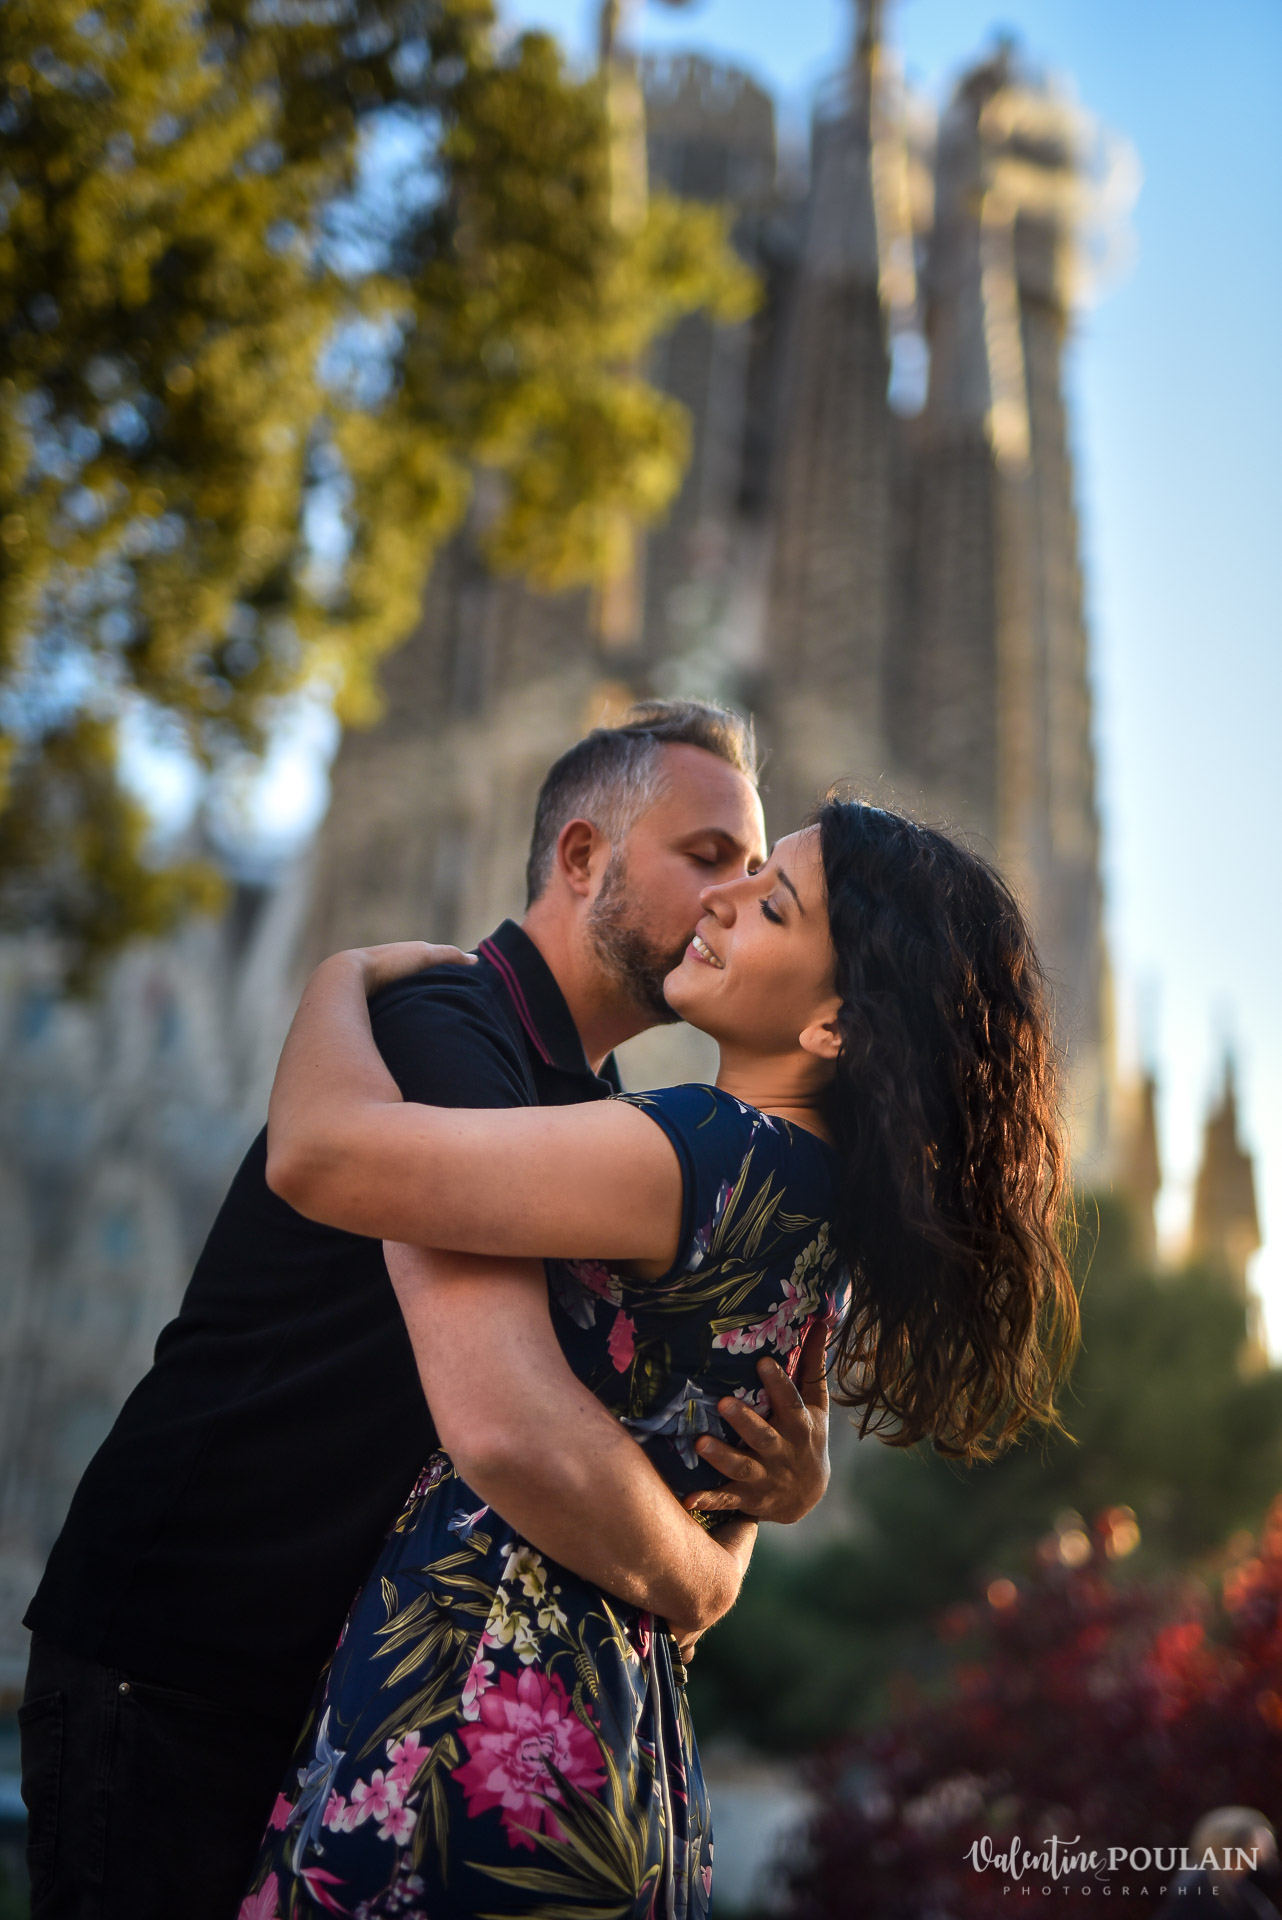 Séance photo couple Barcelone - Valentine Poulain Sagrada Familia